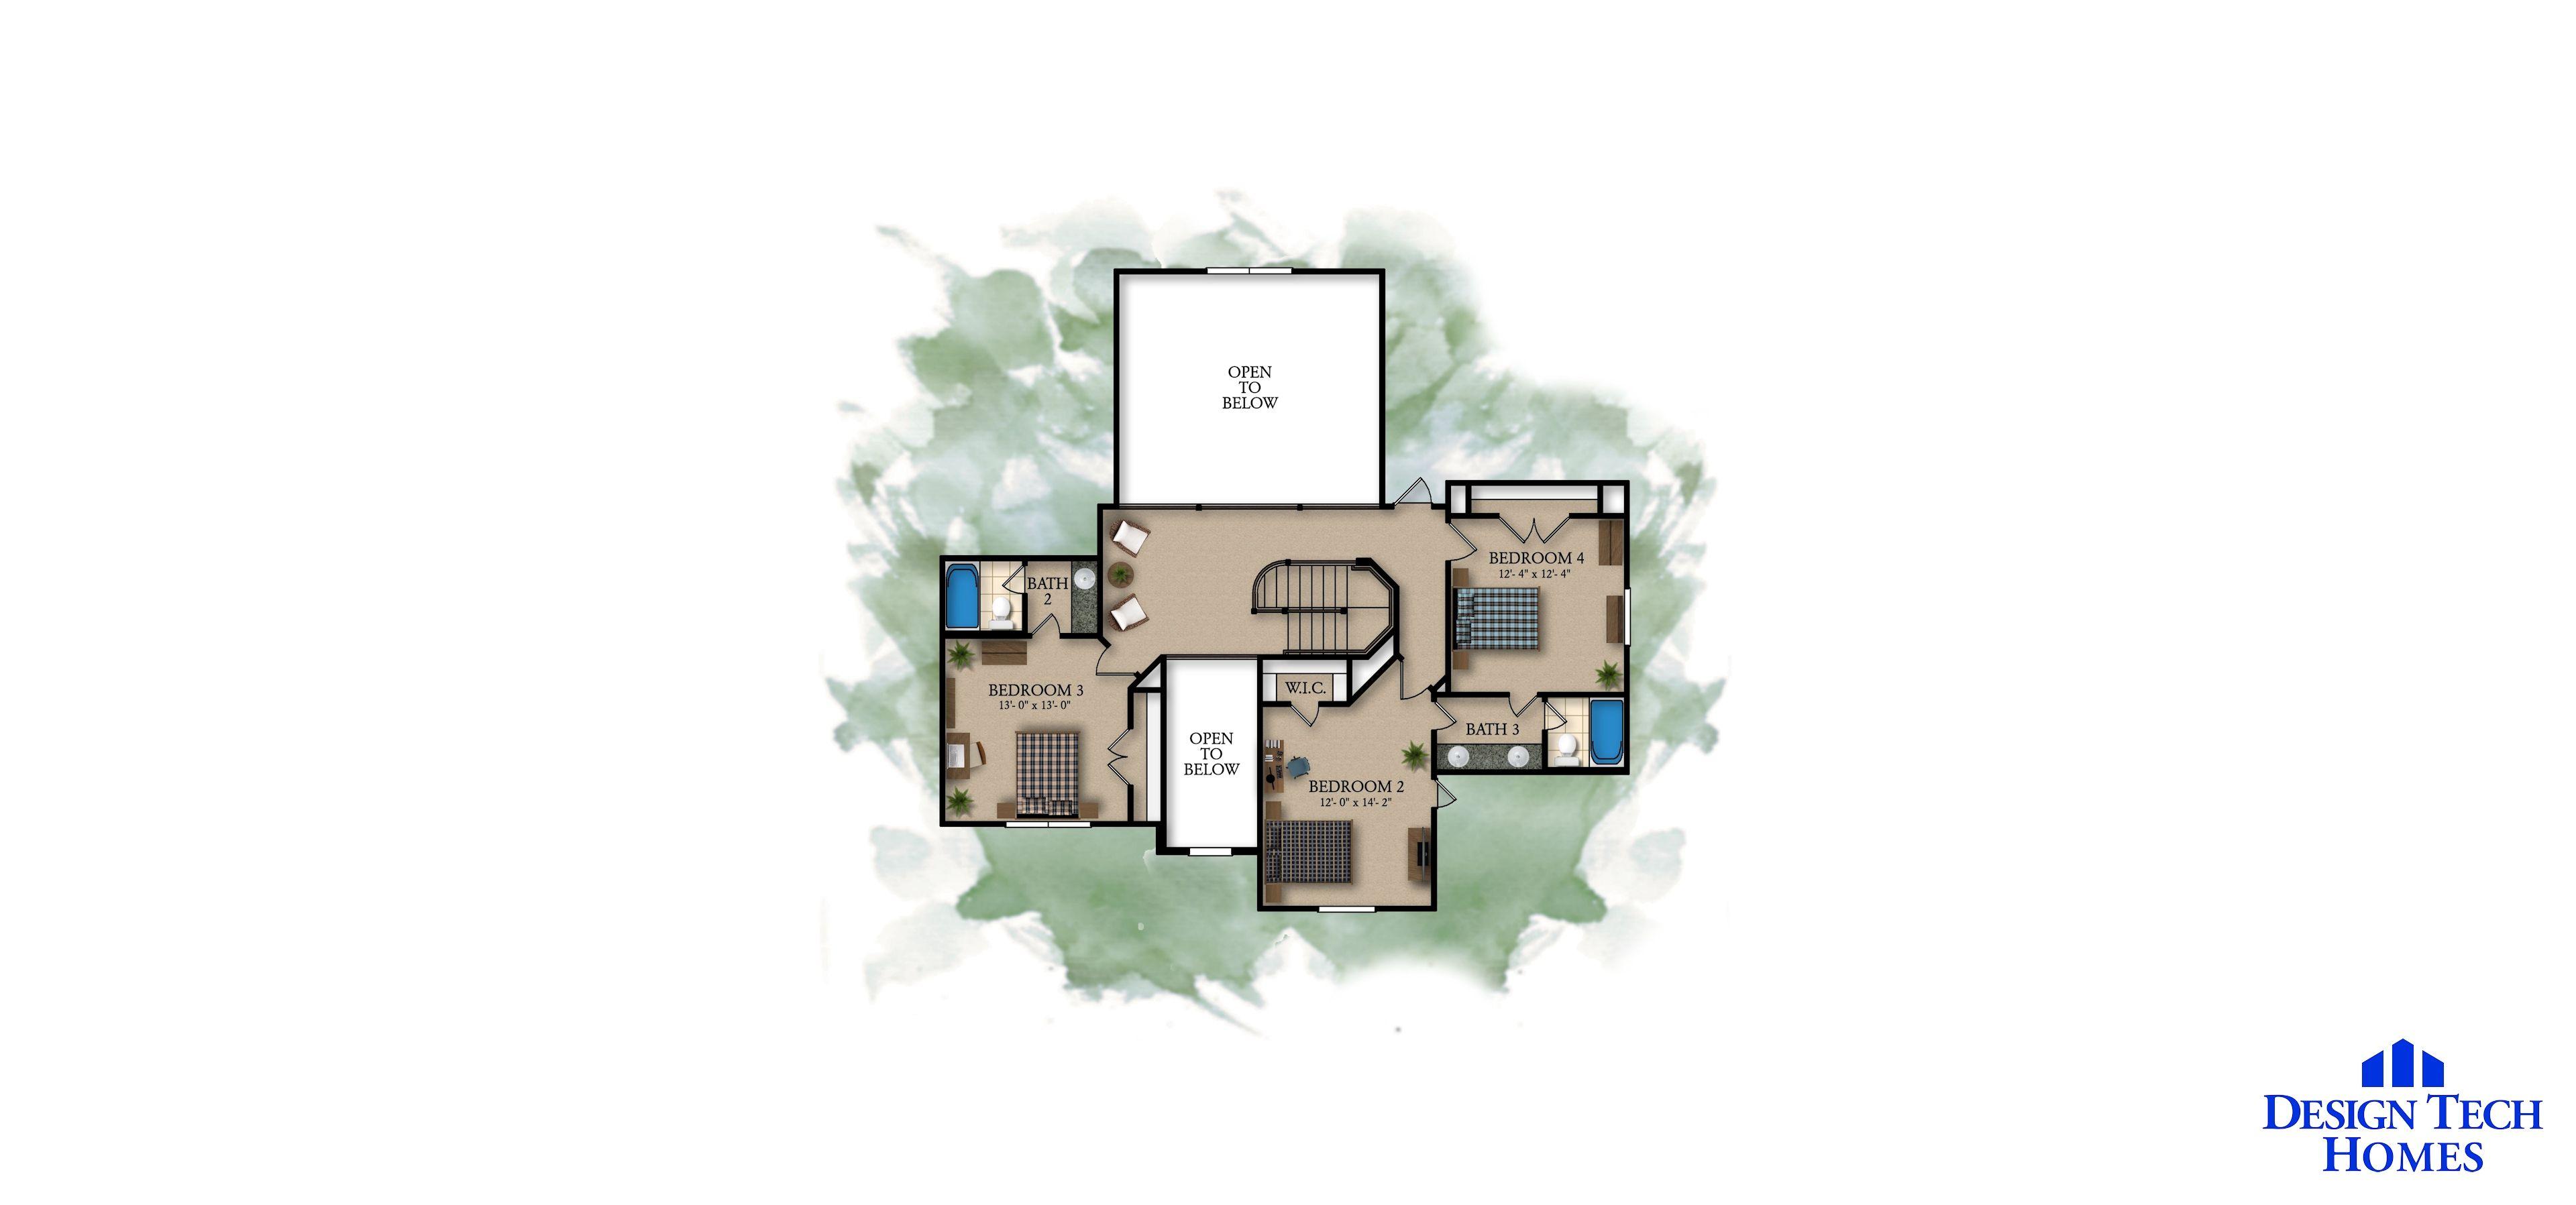 3,271 Sq Ft House Plan - 4 Bed 3.5 Bath, 2 Story - The Woodbridge ...